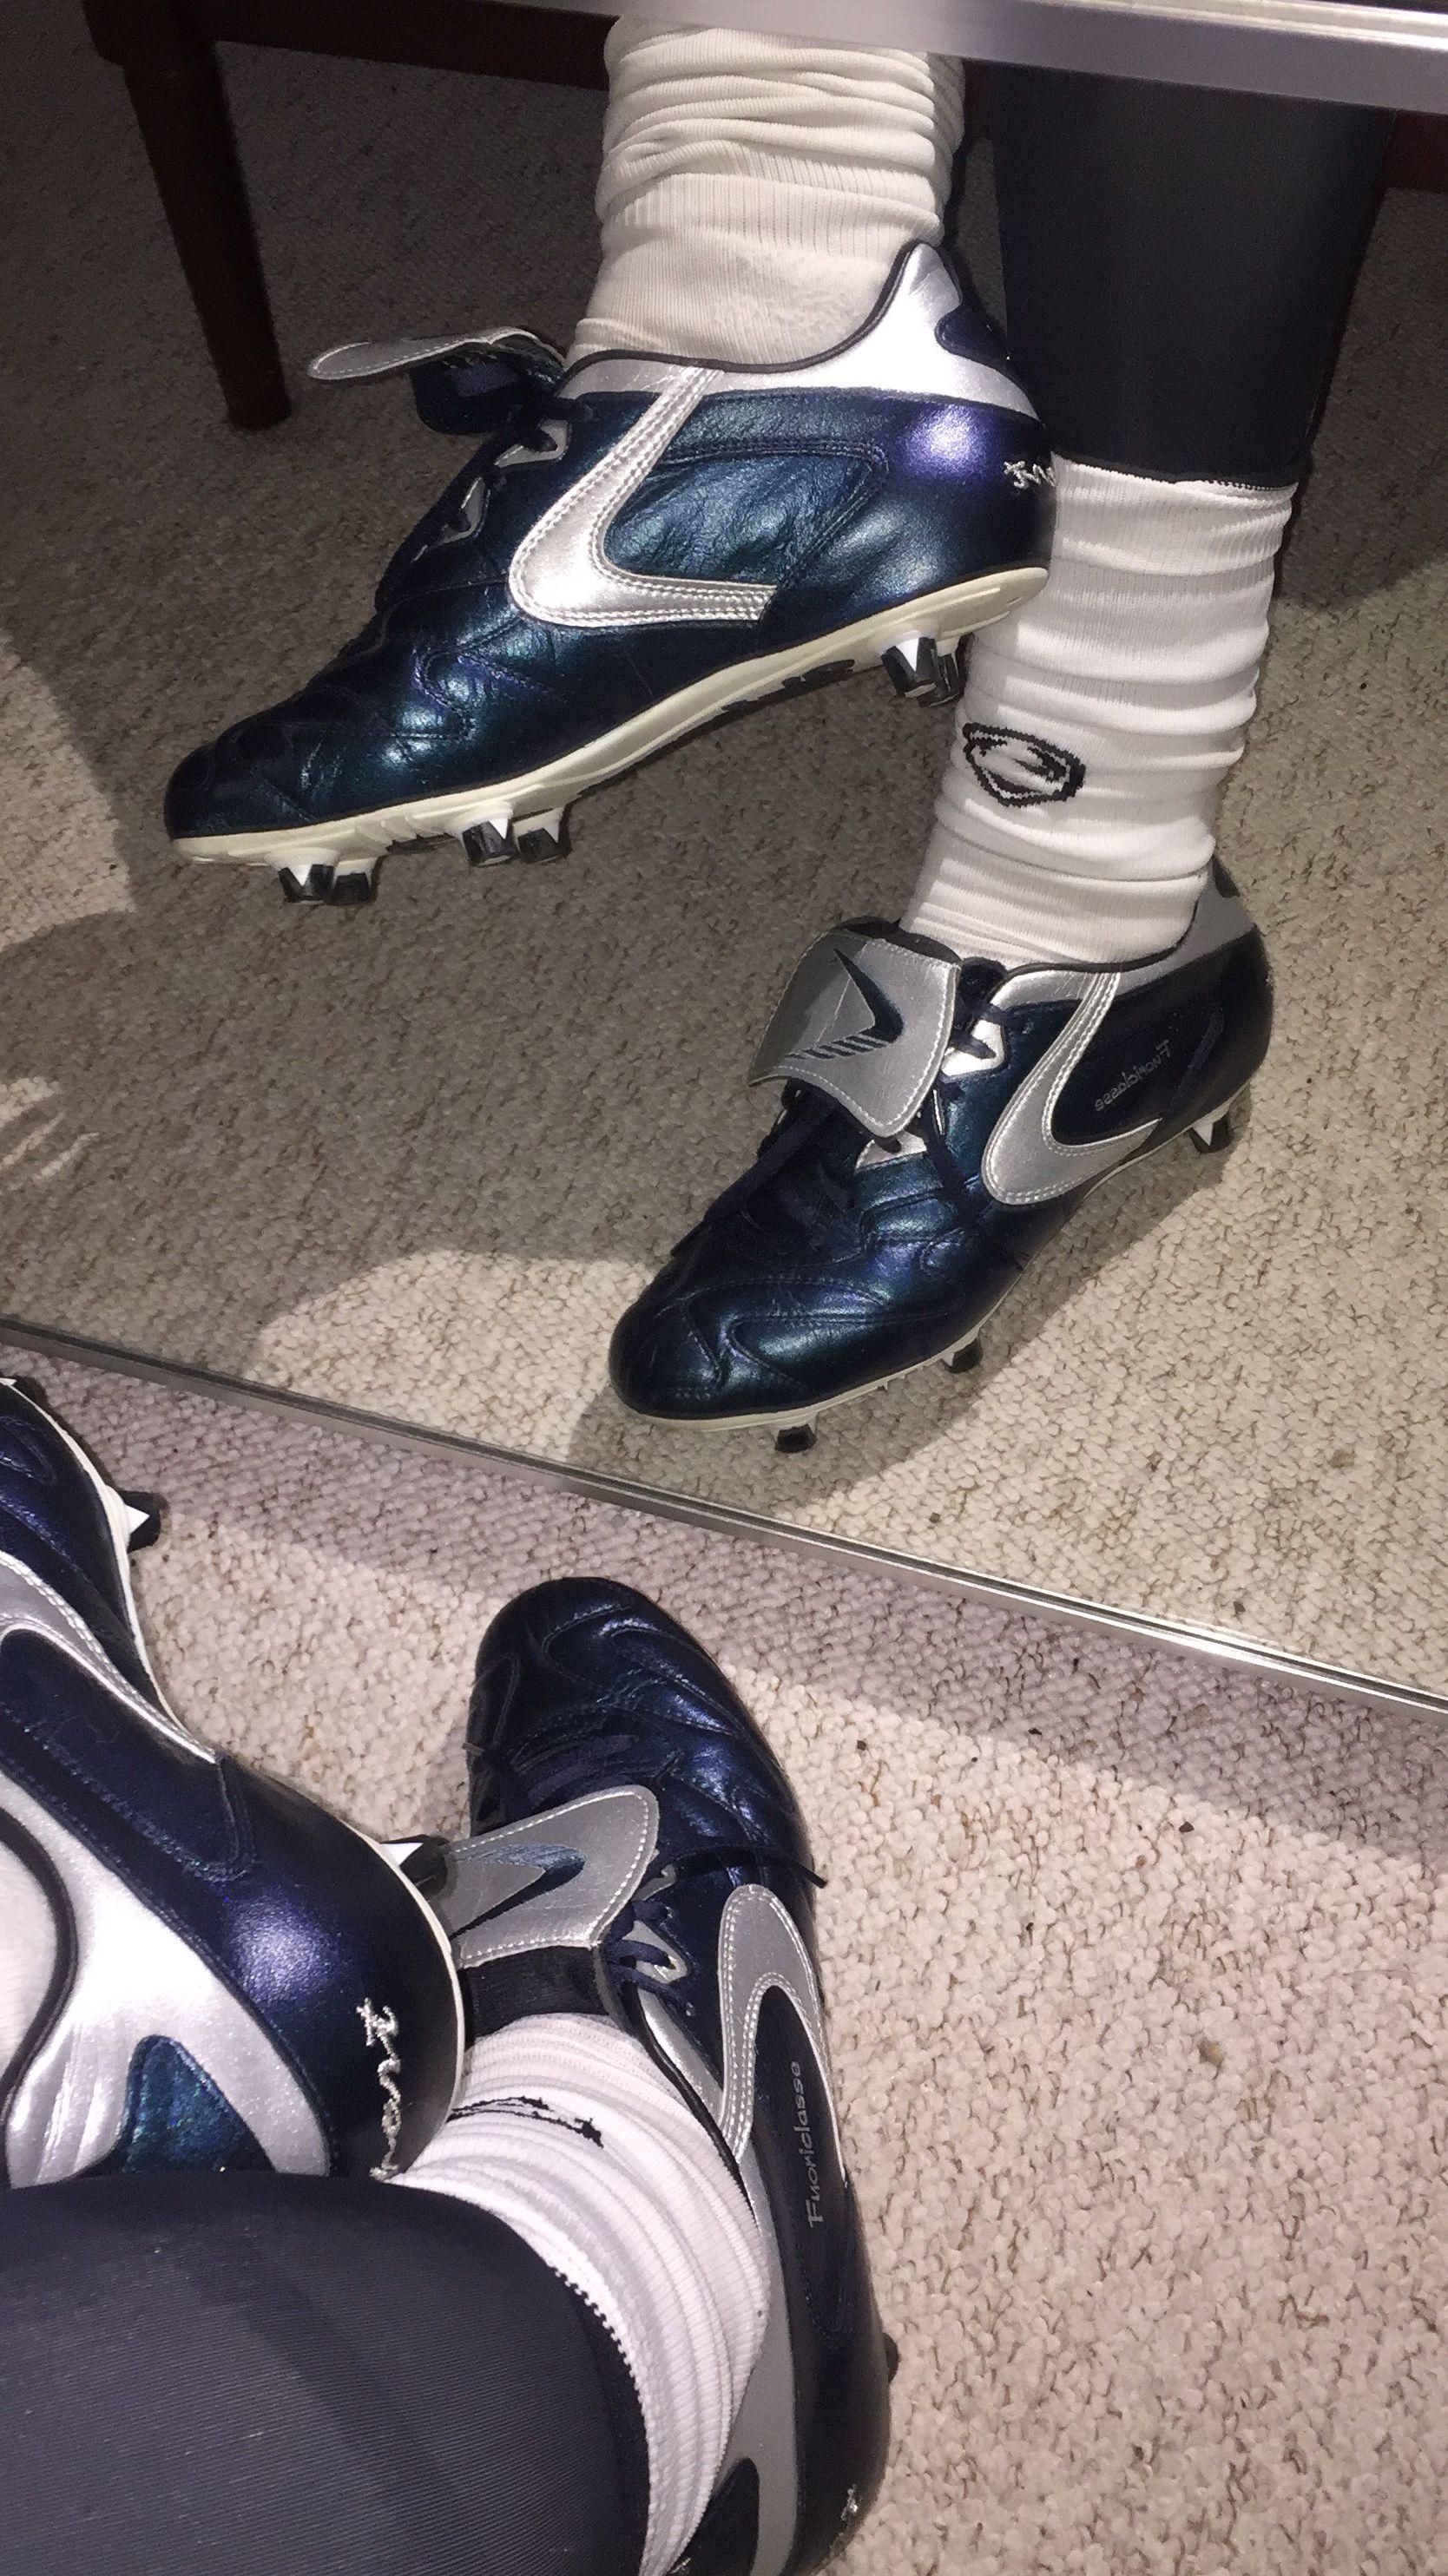 Nike Tiempo 94 Football Boots BlackWhiteDel SolGold